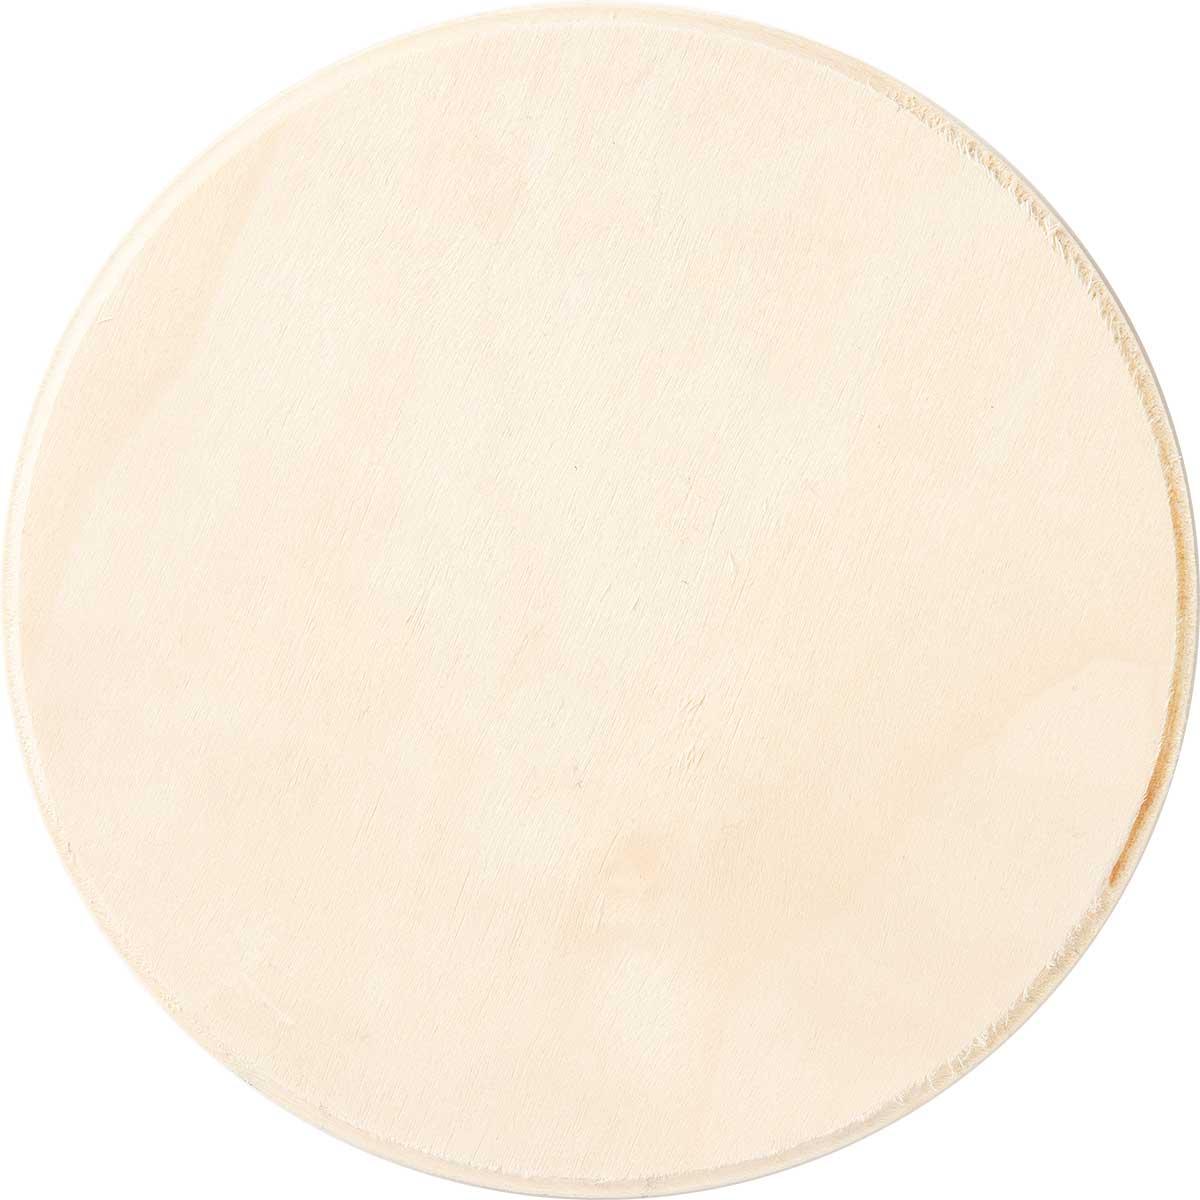 Plaid ® Wood Surfaces - Plaques - Circle